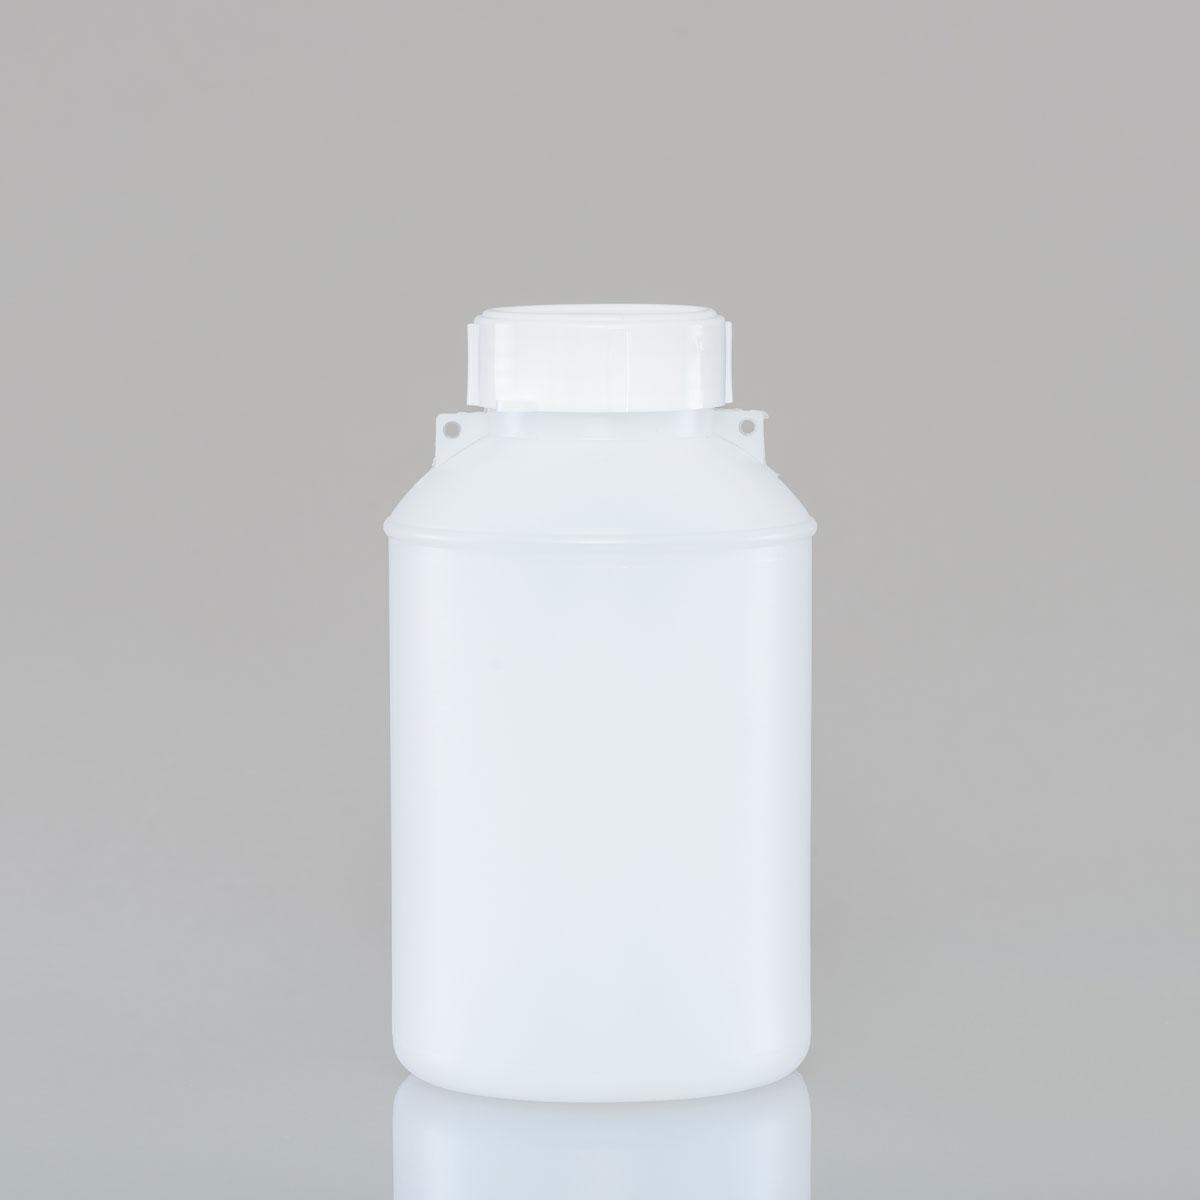 http://fuelsamplebottles.com/wp-content/uploads/gulsby-packaging-004-1200x.jpg